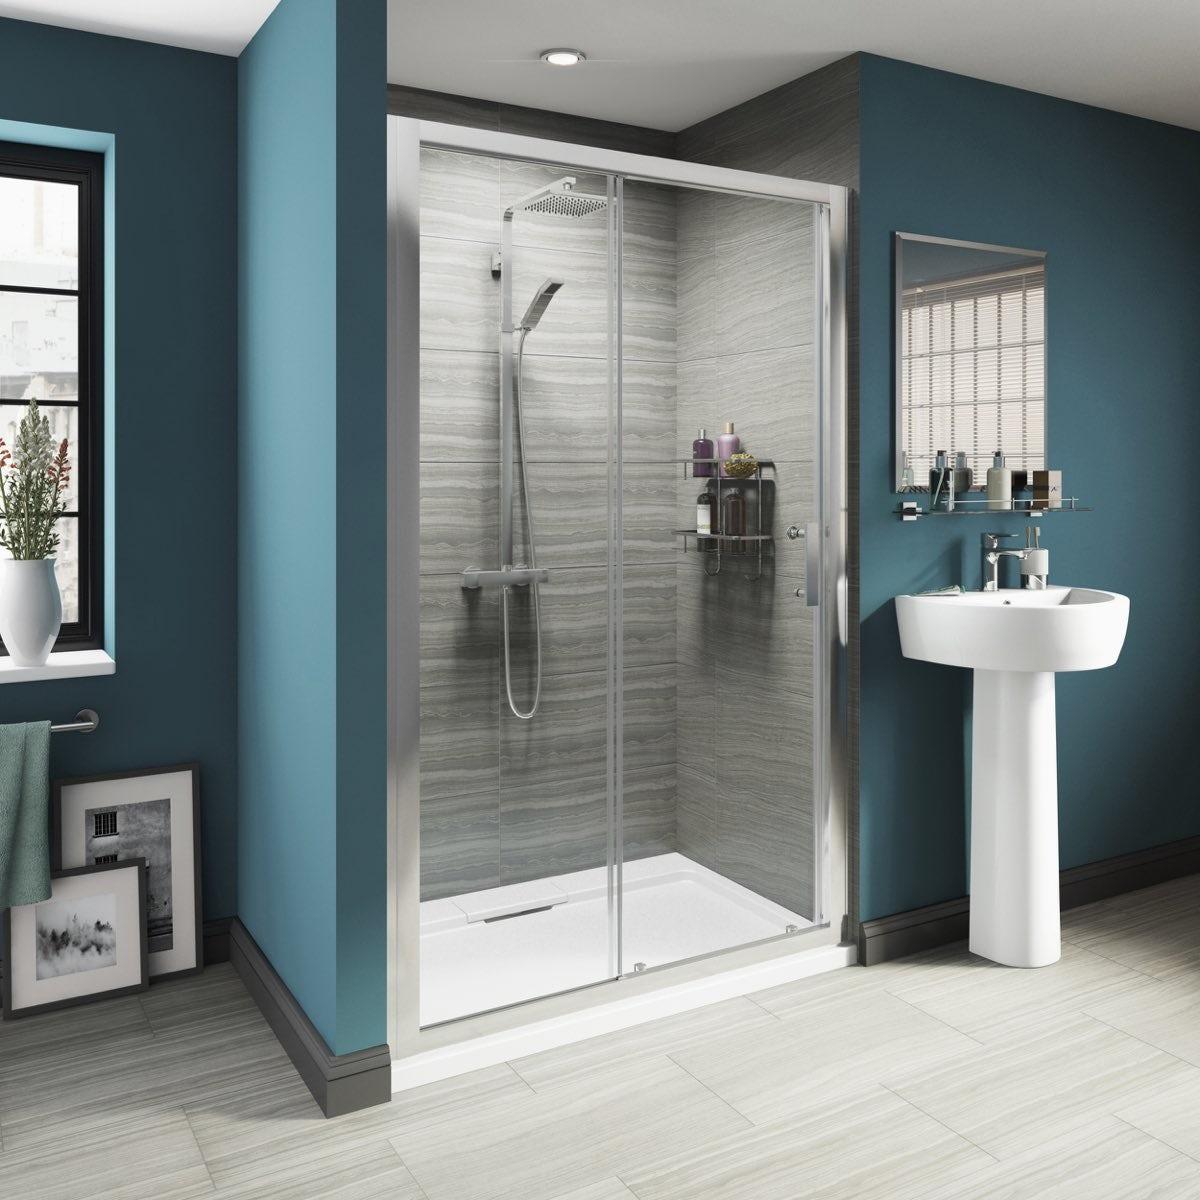 8mm Framed Sliding Shower Door 1200 with Tray  VictoriaPlumcom